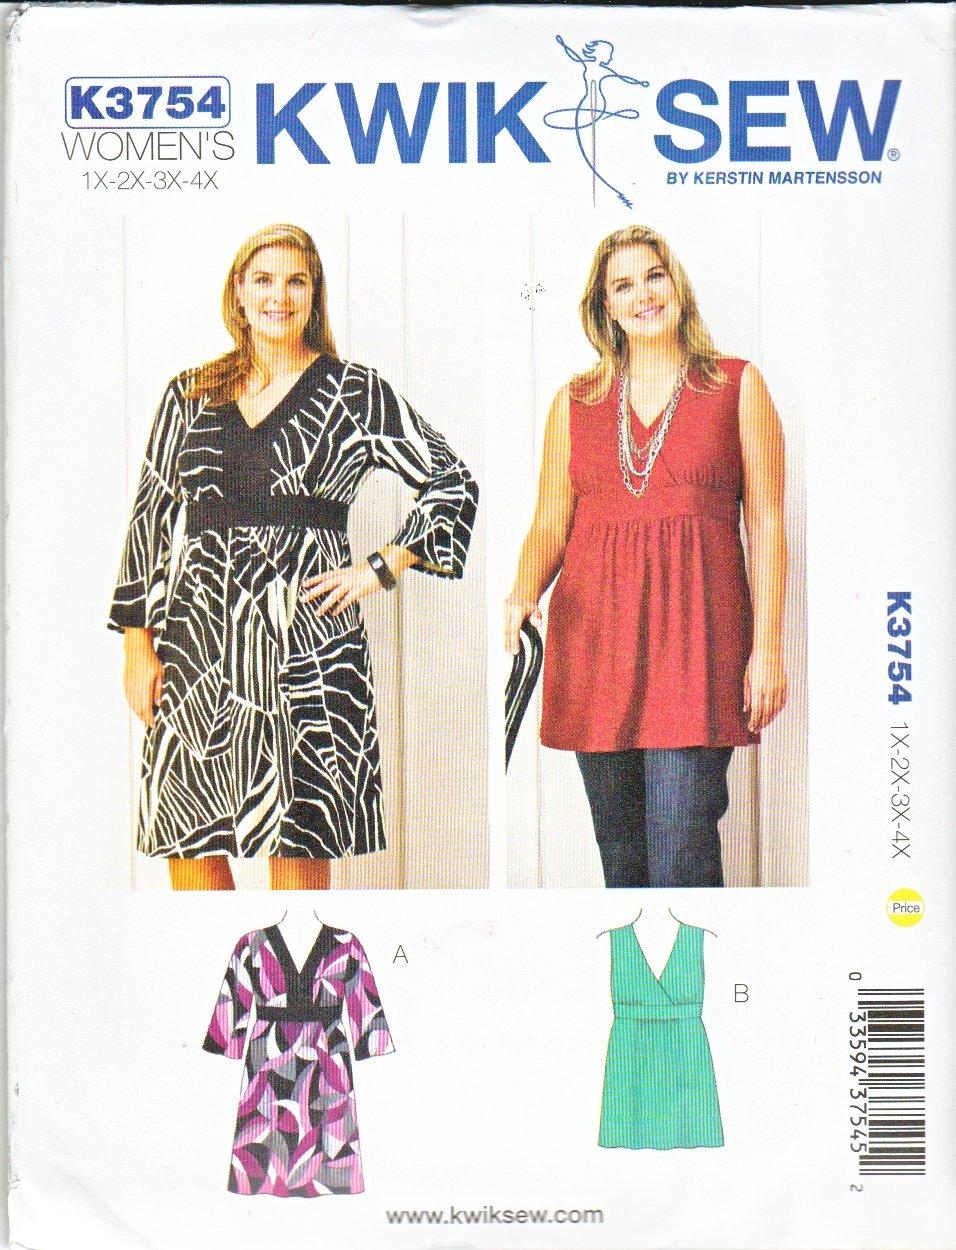 Kwik Sew Sewing Pattern 3754 Women's Plus Size 1X-4X (22W-32W) Pullover Dress Tunic Sleeve Options